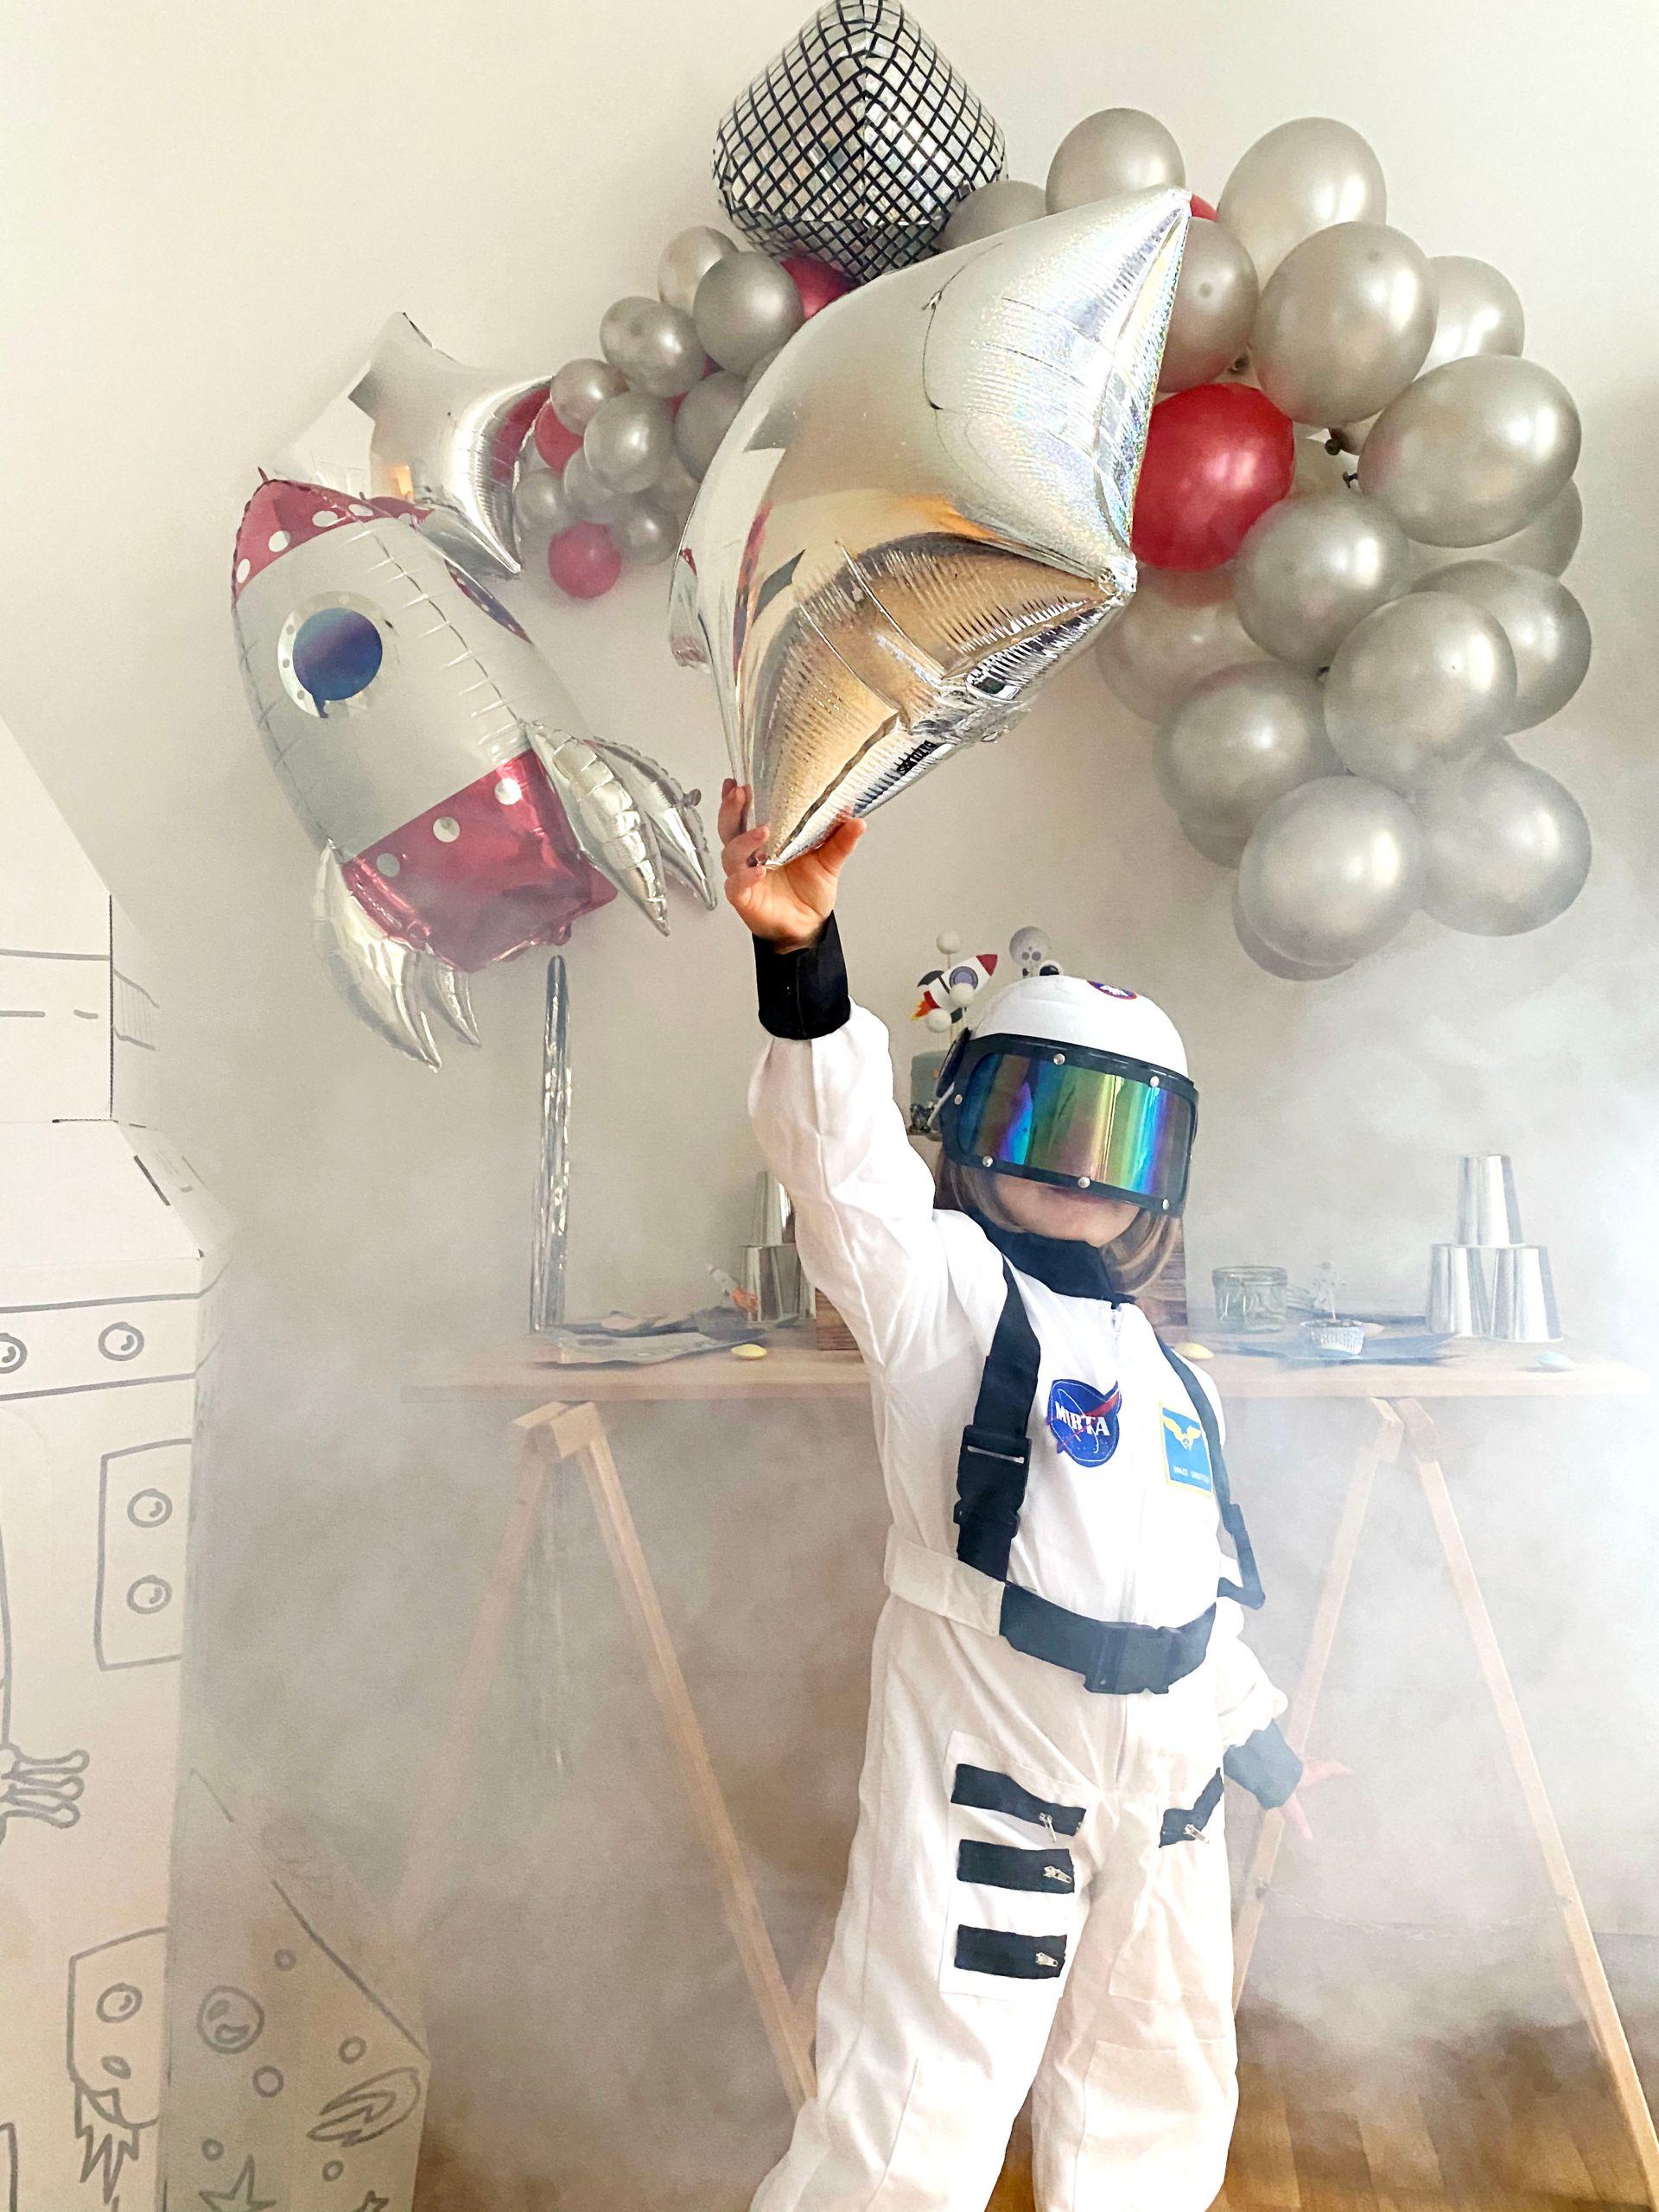 An Astronaut's Intergalactic Celebration